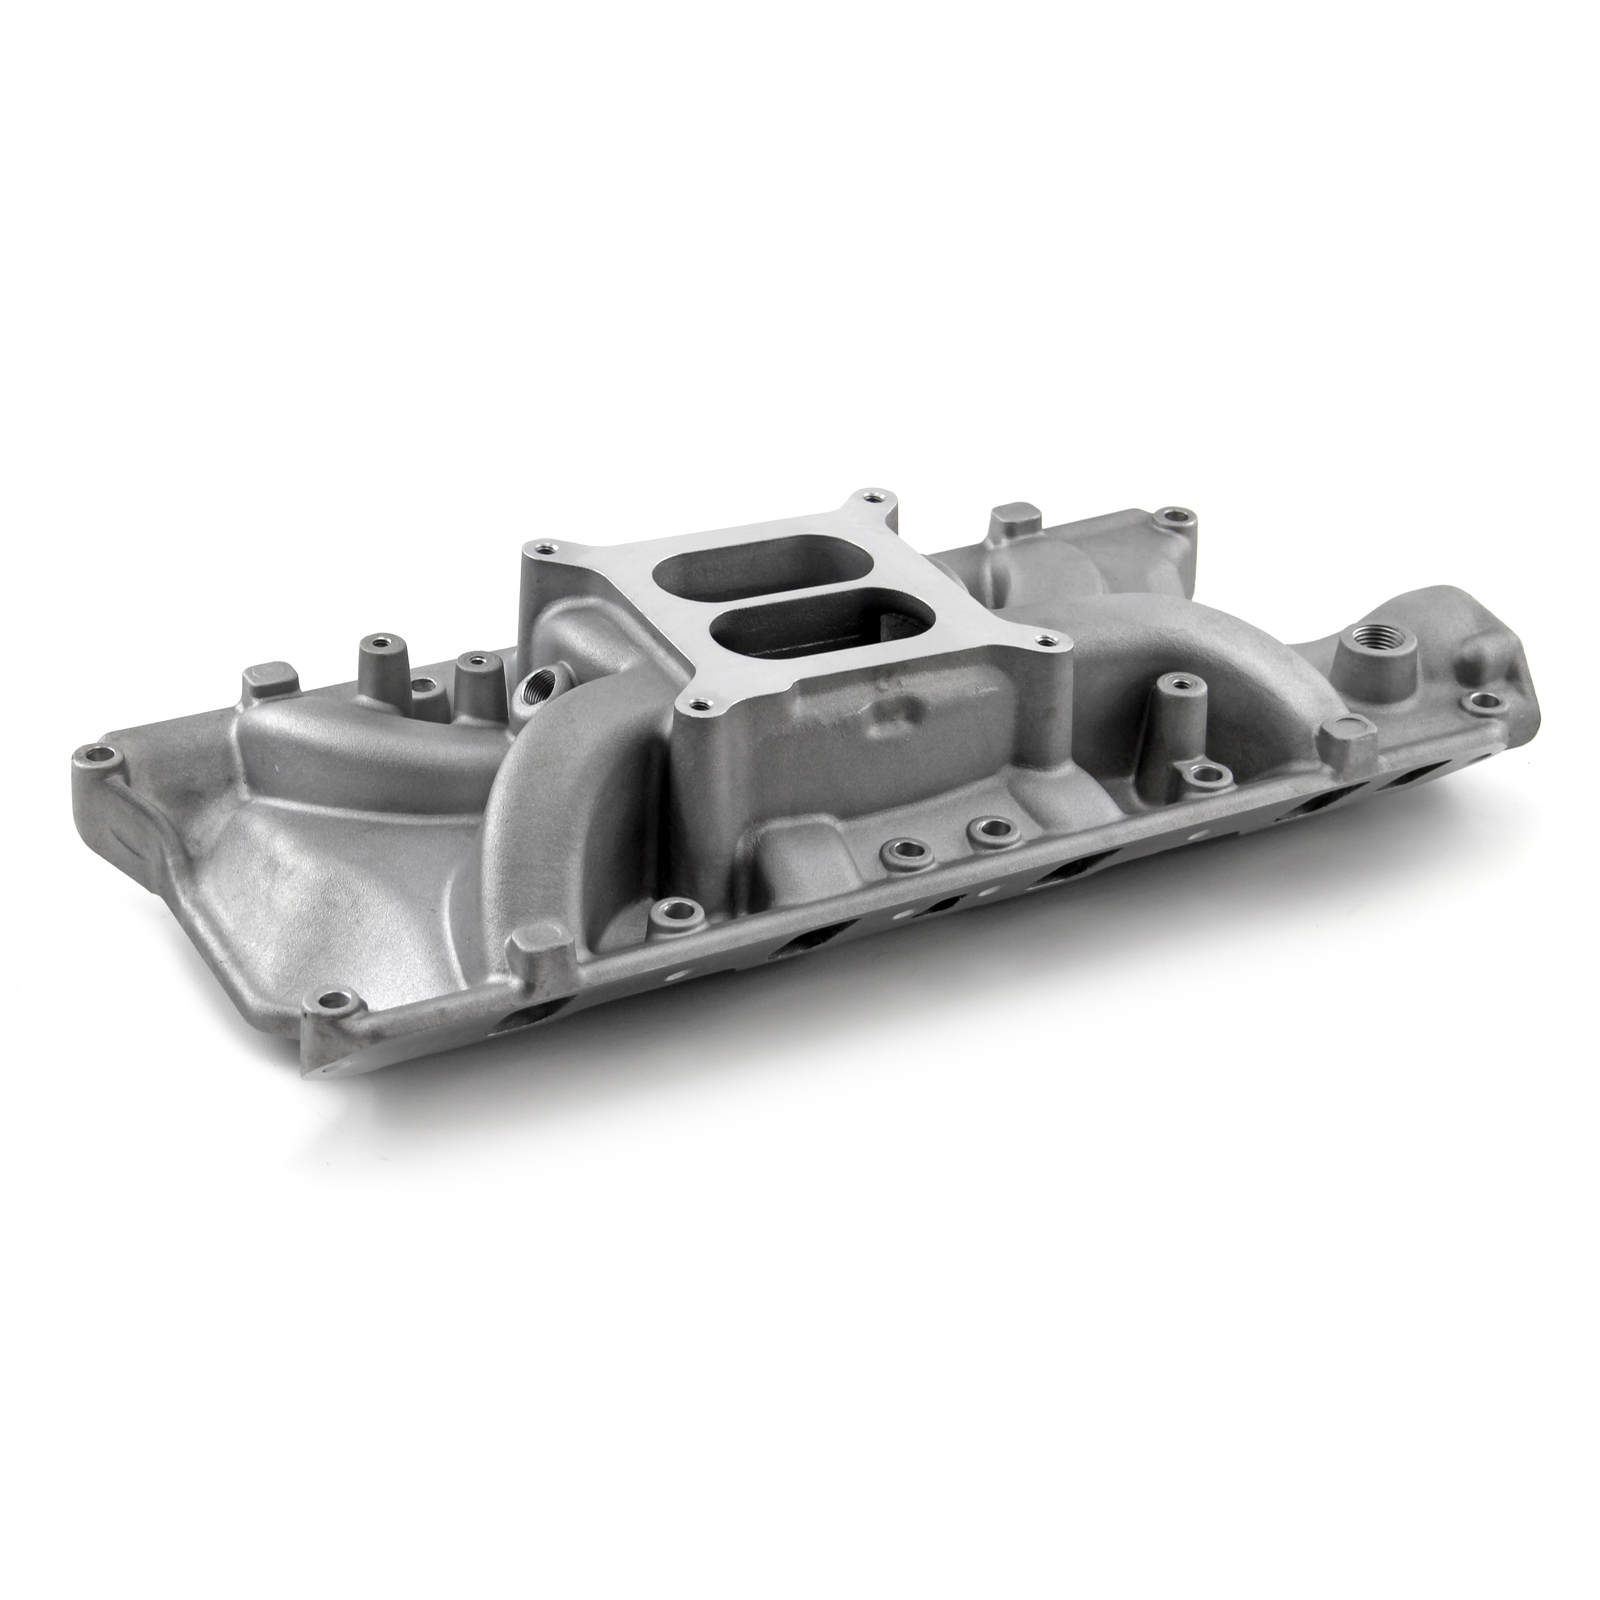 Ford-SB-260-289-302W-Windsor-Qualifier-Style-Intake-Manifold-Satin